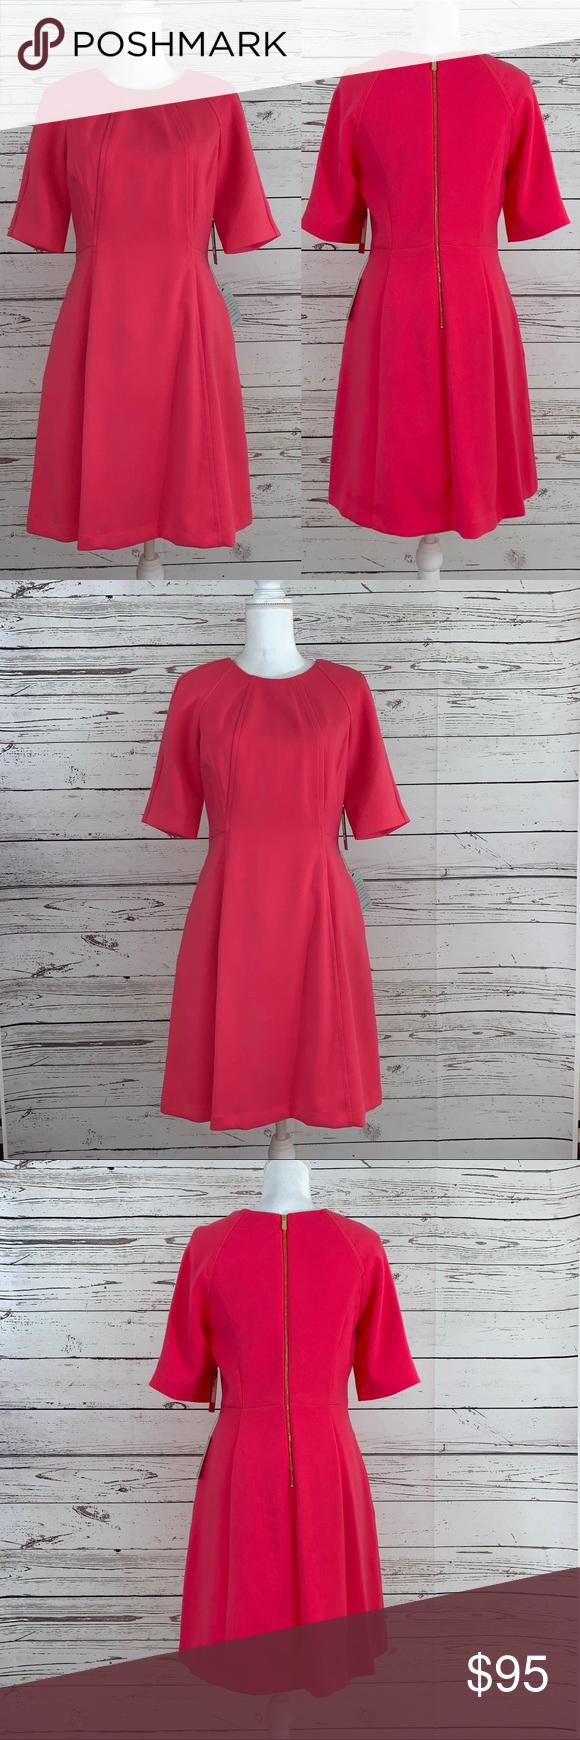 Nwt Vince Camuto Pink Dress Pink Dress Dresses Clothes Design [ 1740 x 580 Pixel ]